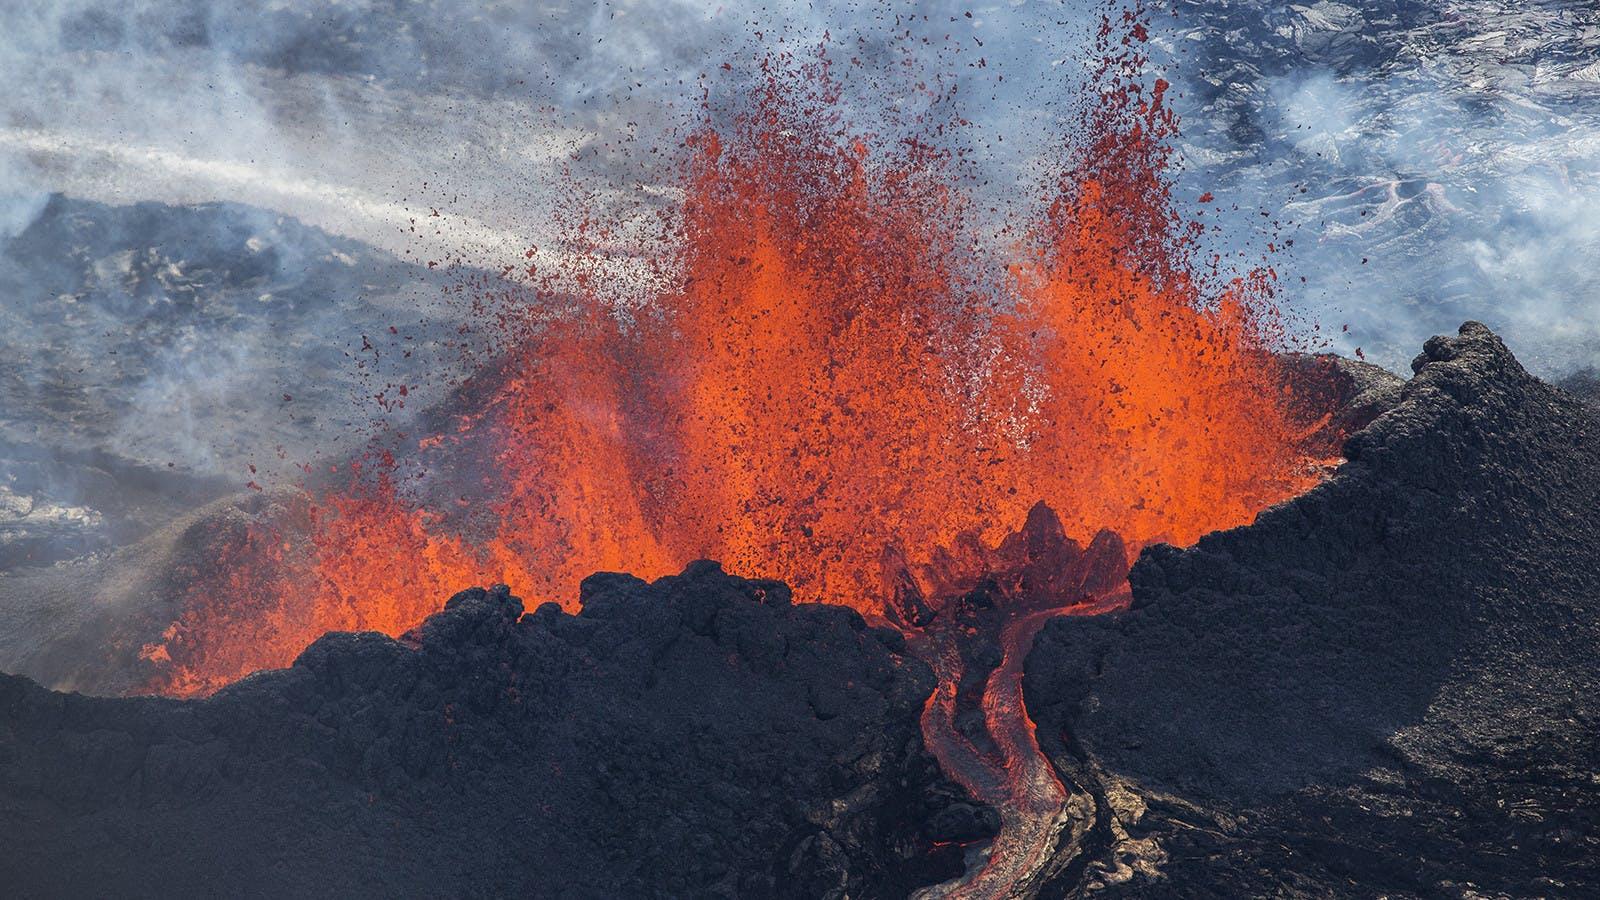 Vulkanischer Ausbruch in Island